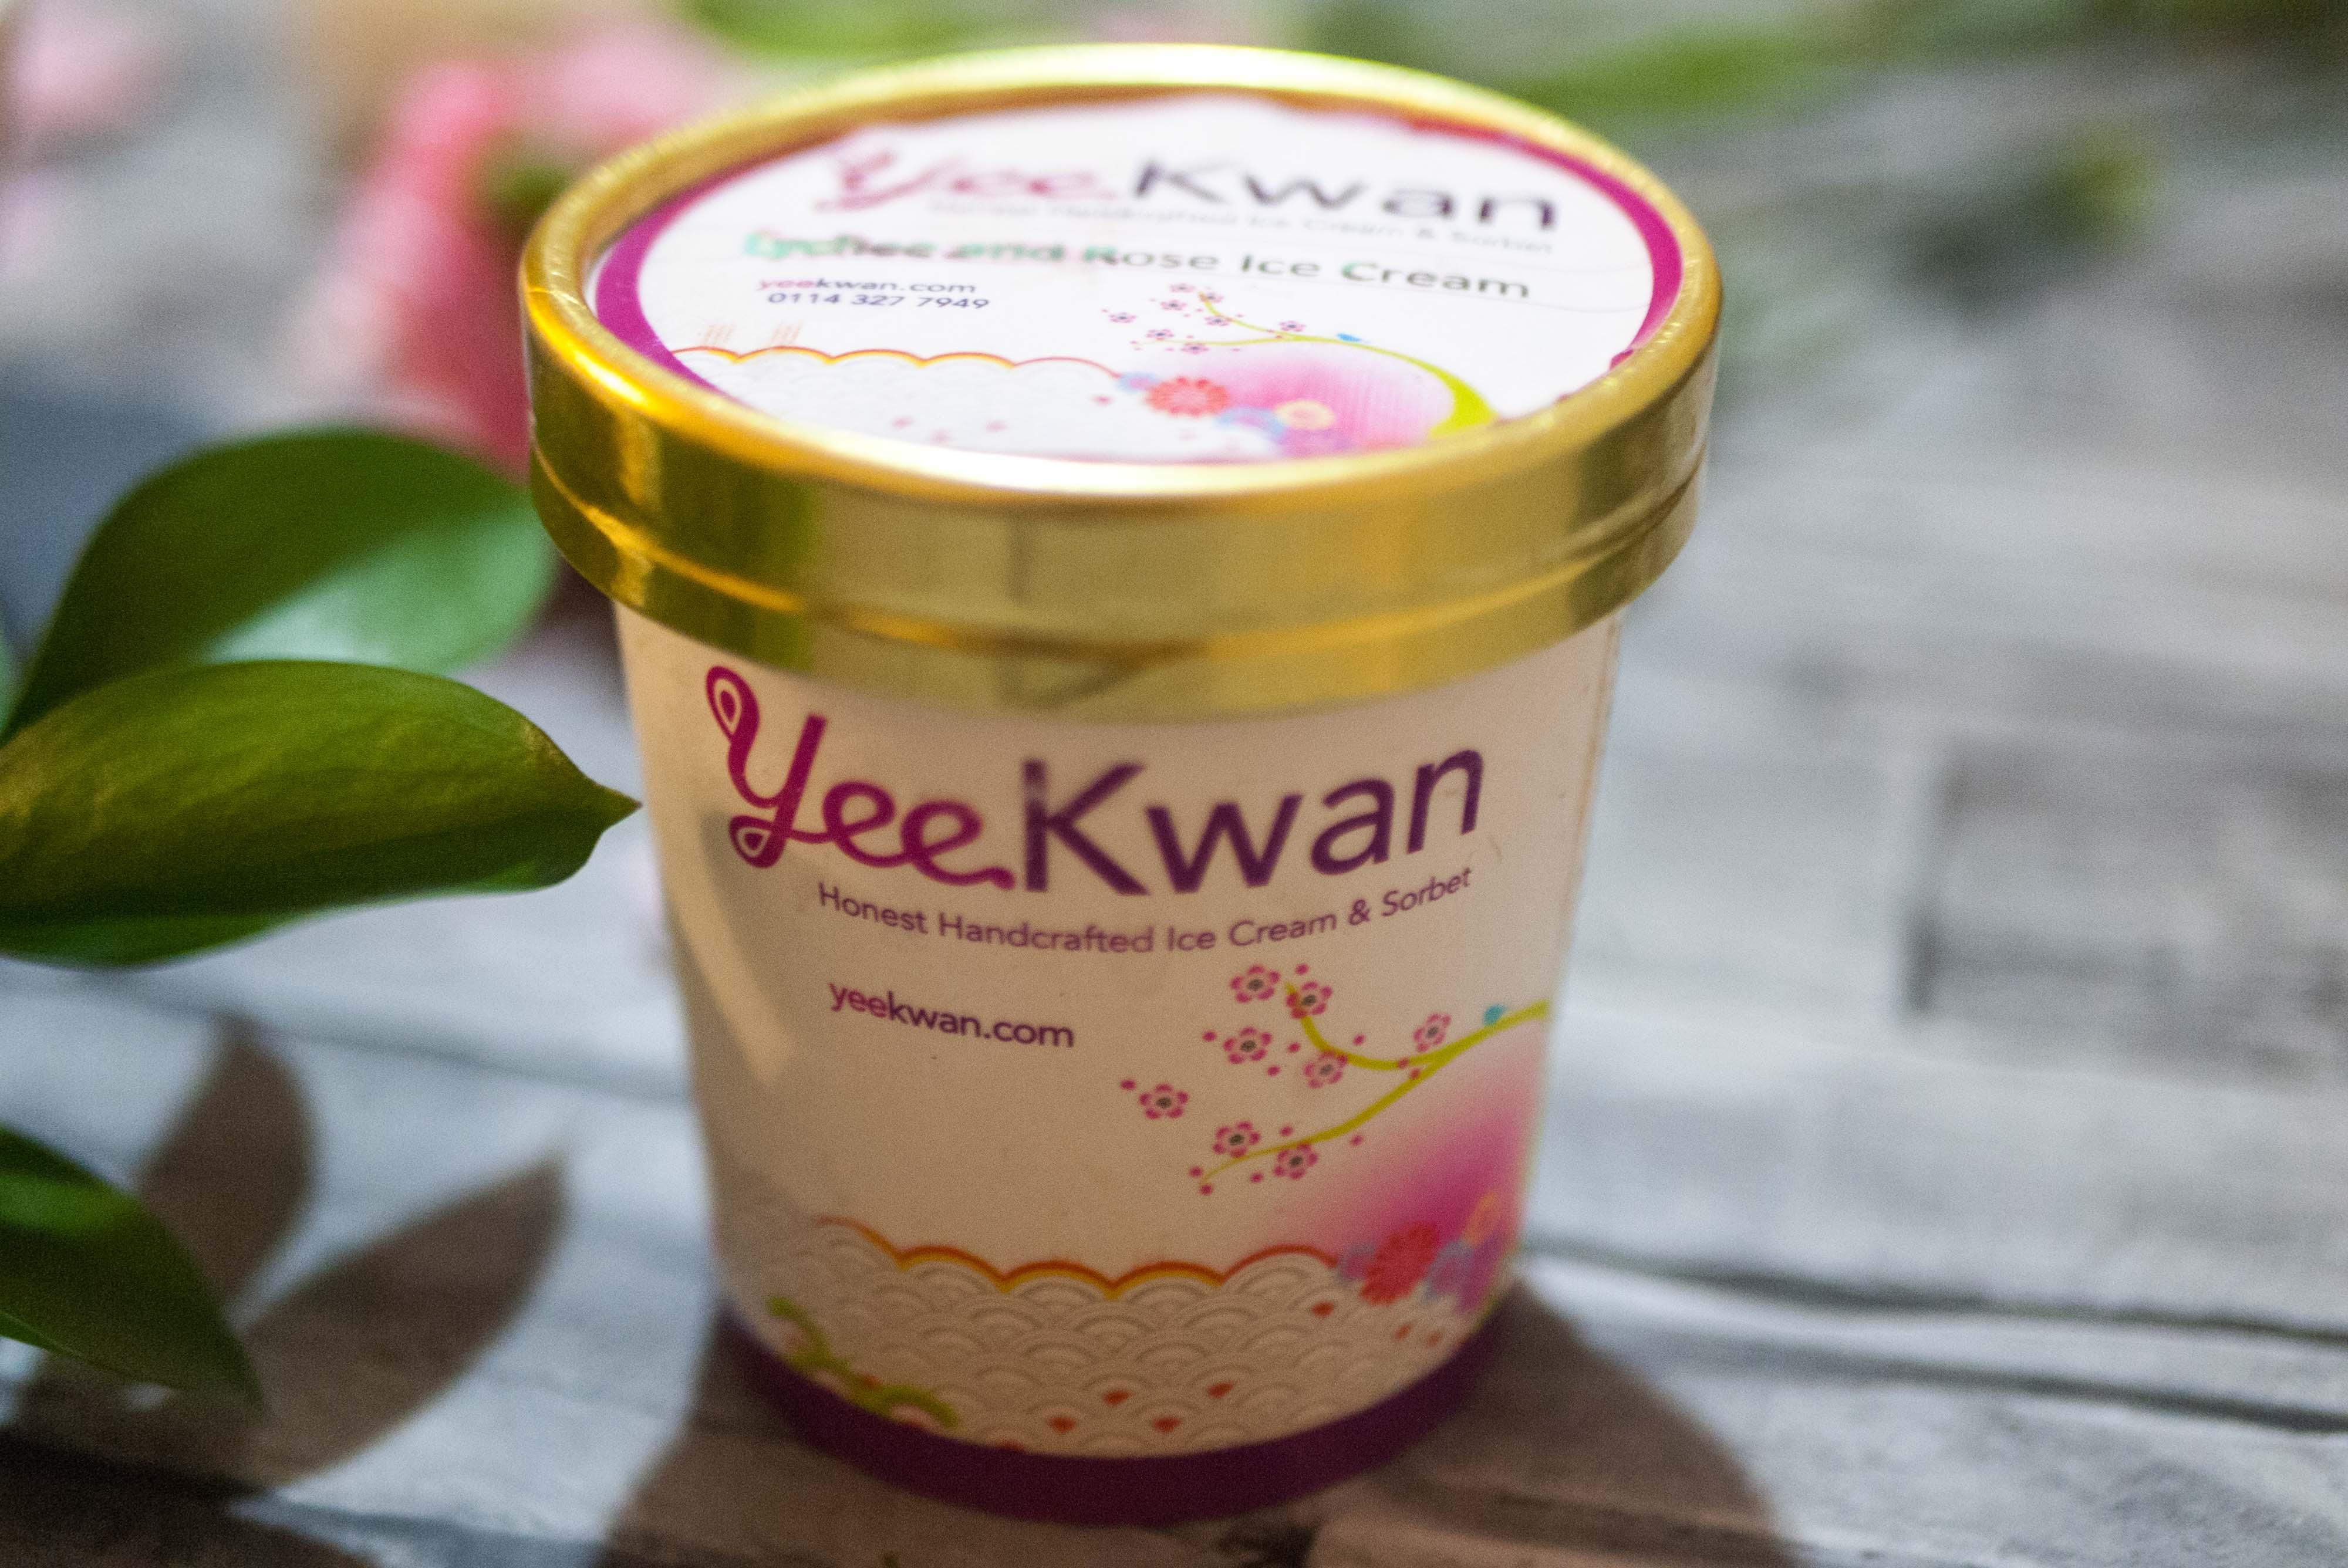 Yee Kwan ice cream tub